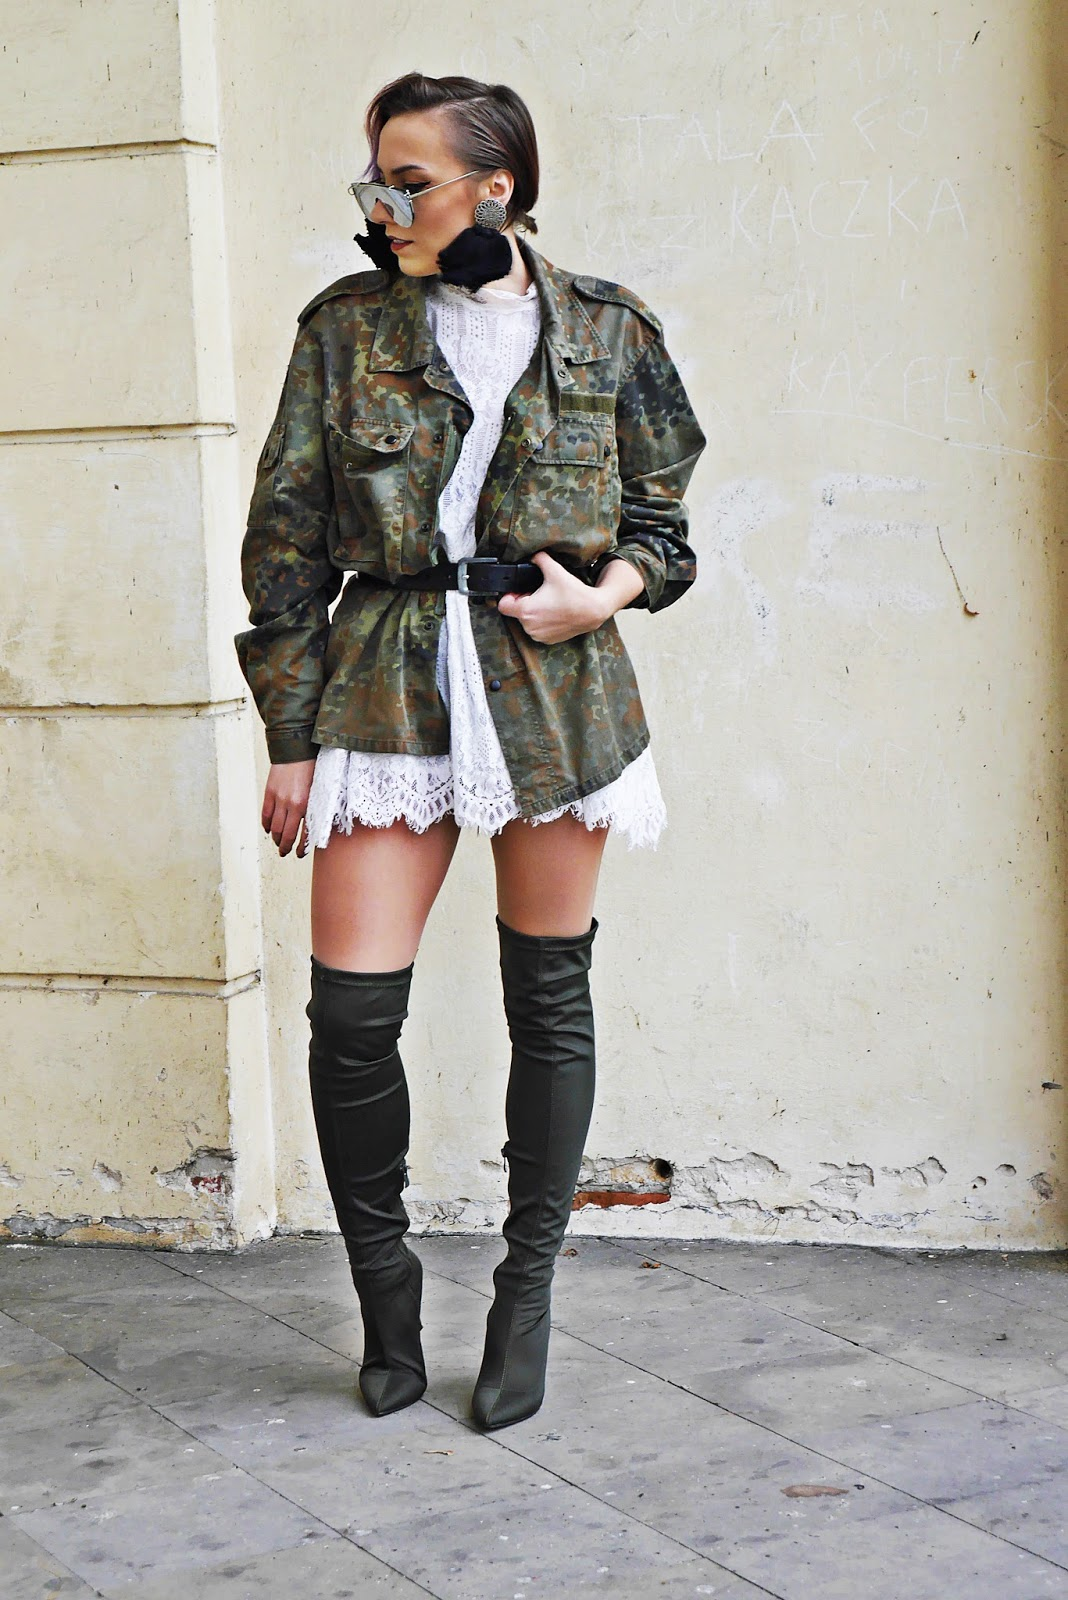 6_moro_kurtka_sh_koronkowa_biala_sukienka_karyn_blog_buty_renee_031217b